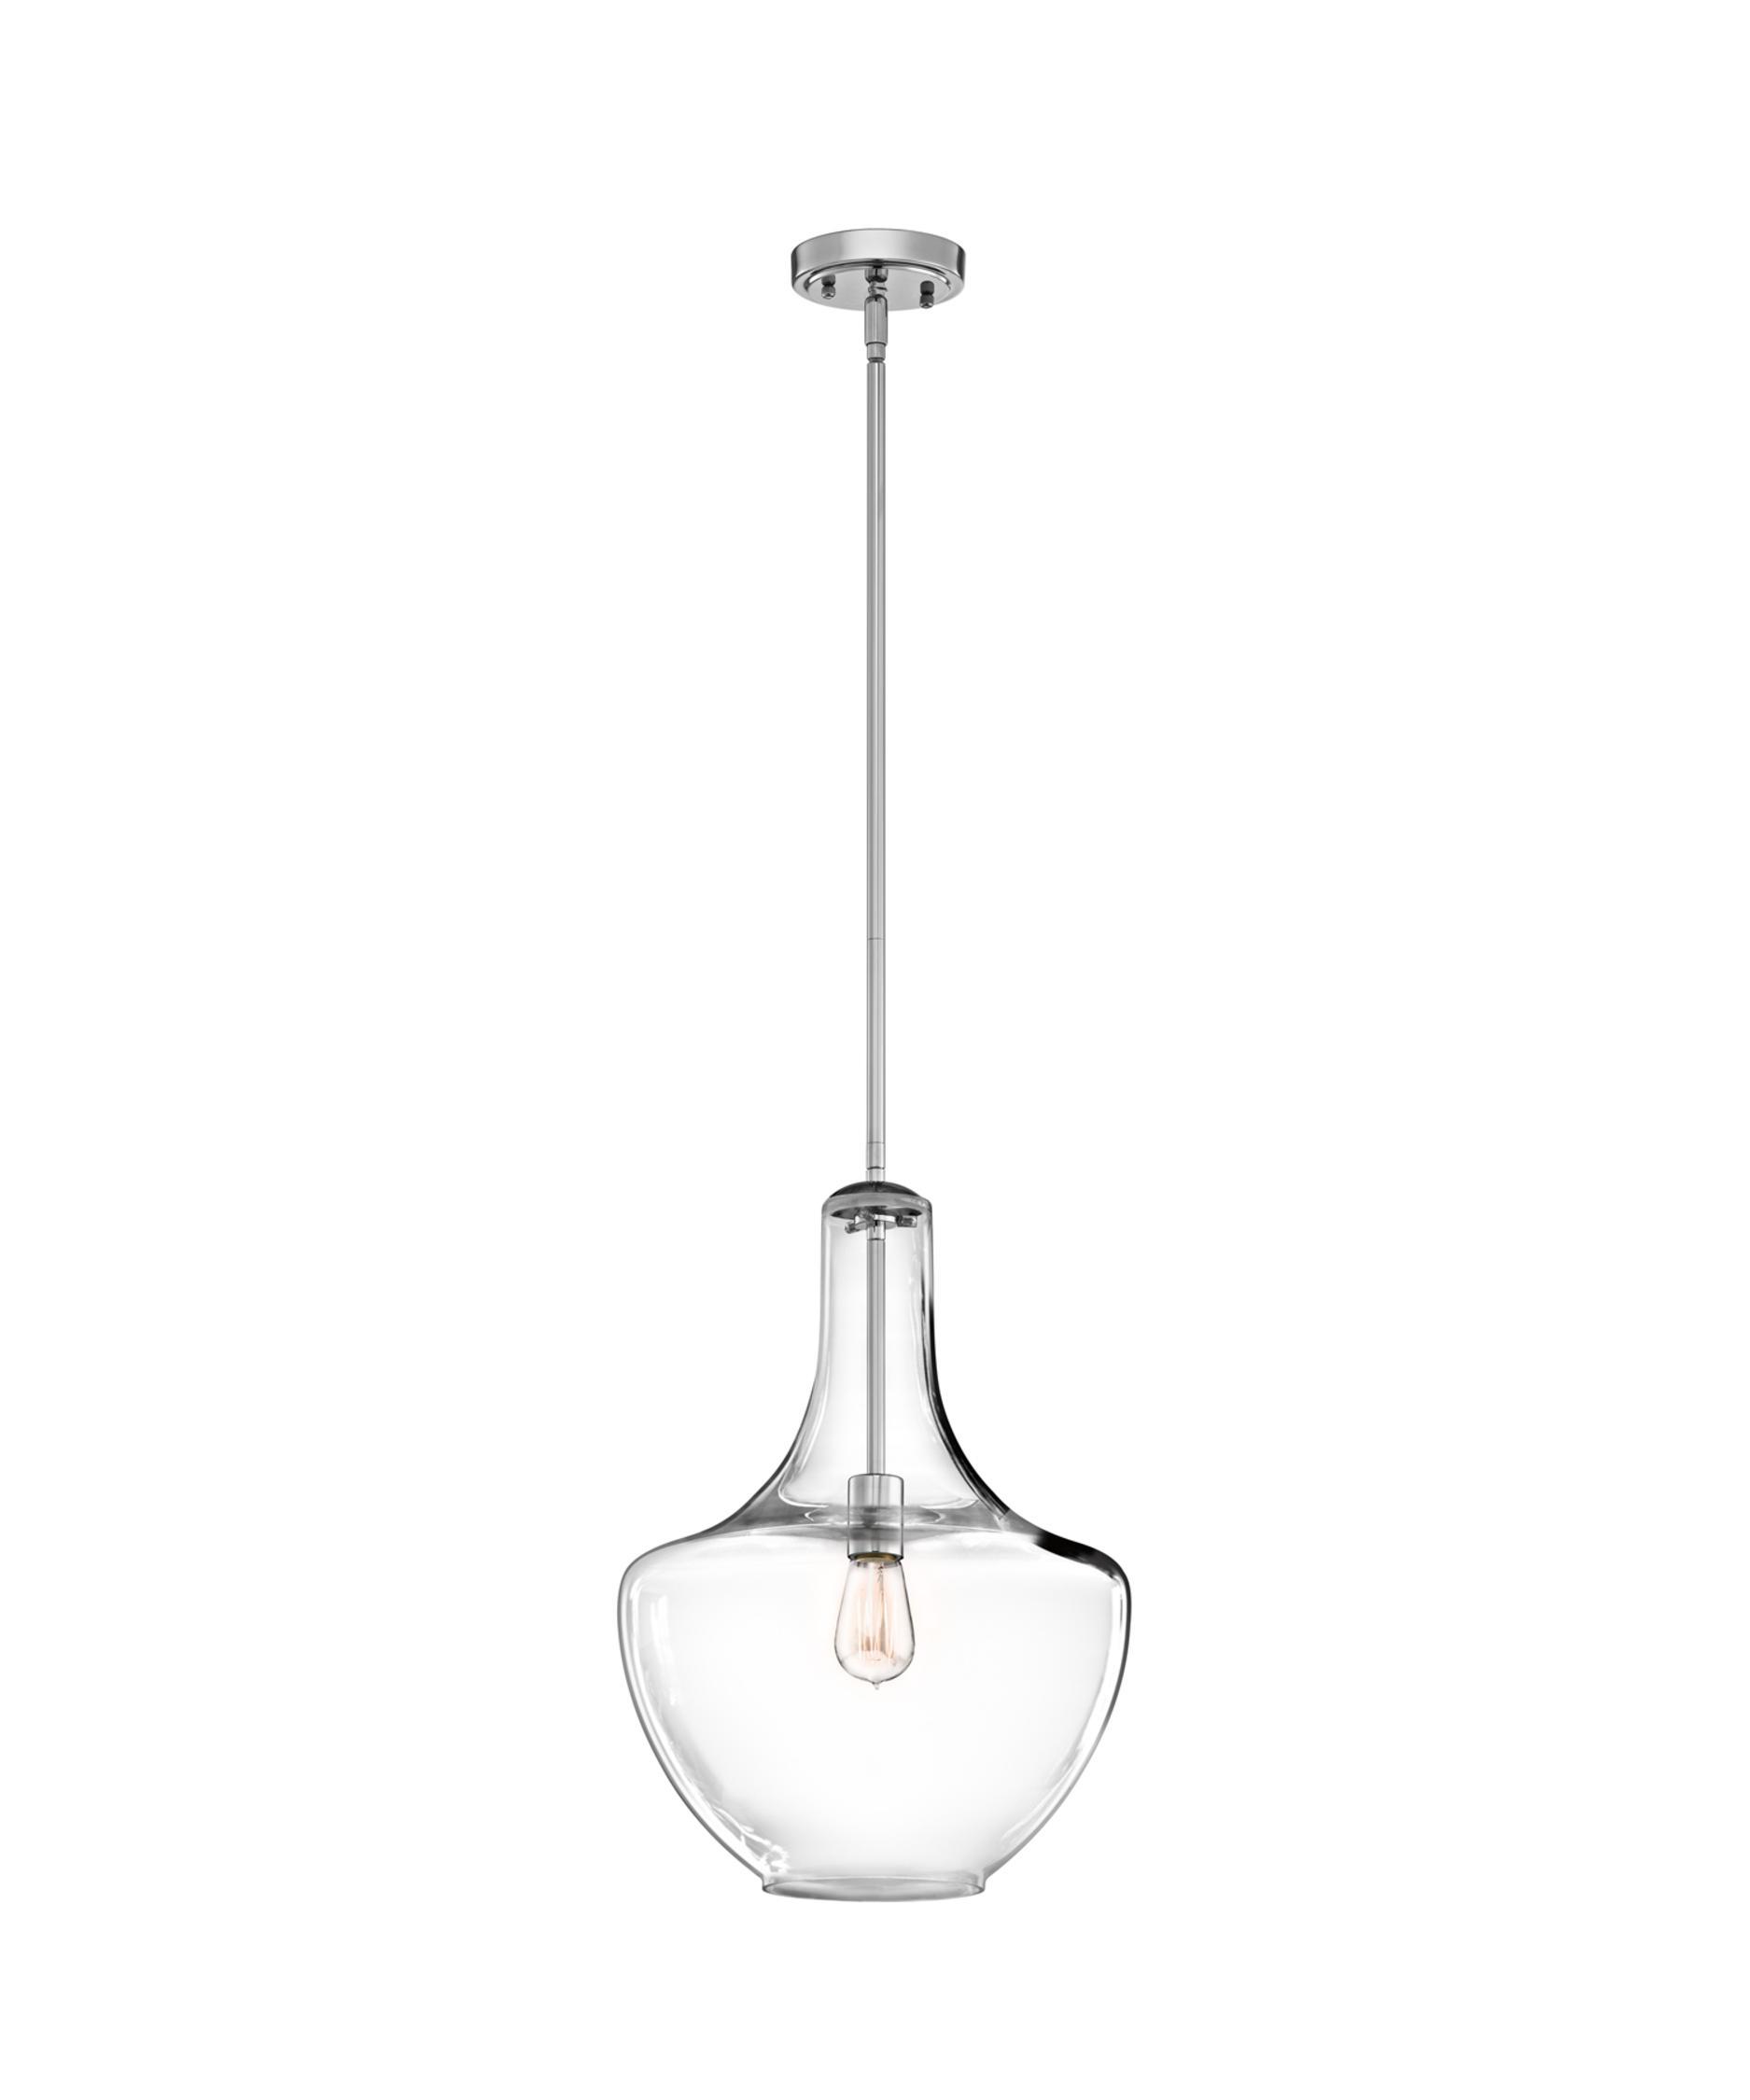 kichler everly 14 inch wide 1 light mini pendant capitol lighting - Brushed Nickel Pendant Light